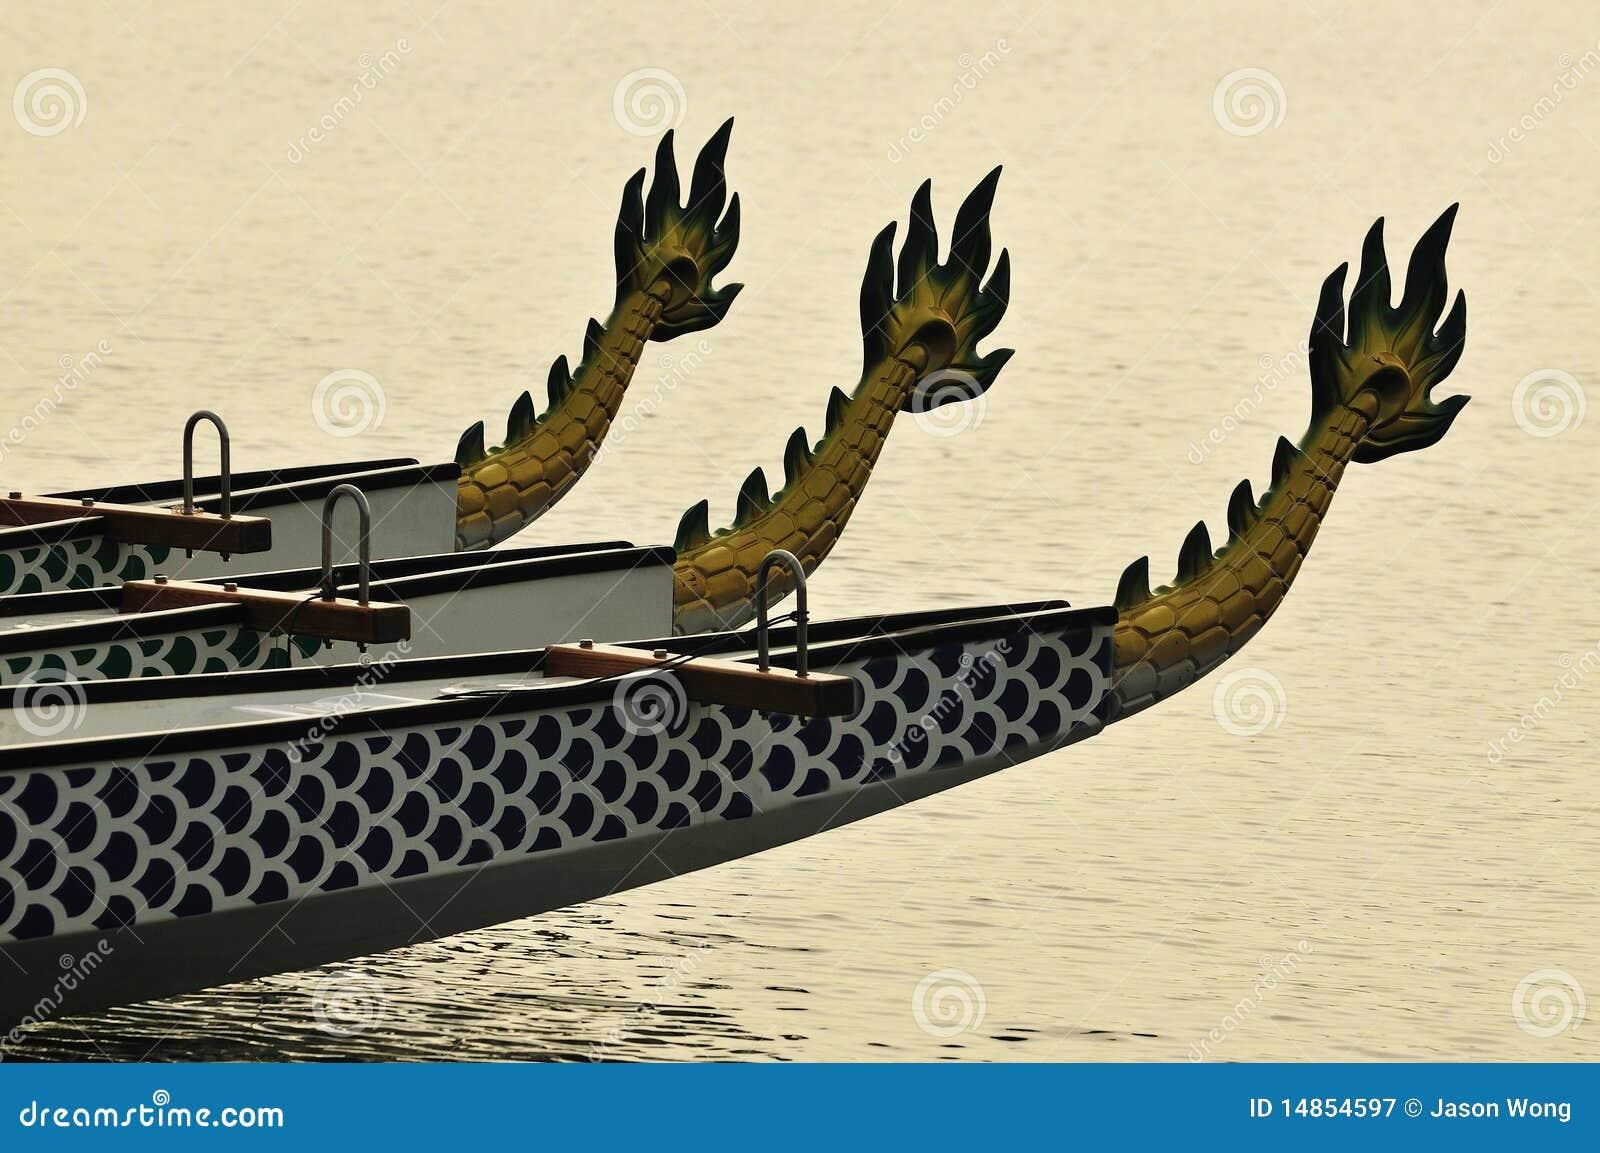 Dragon Boat 01